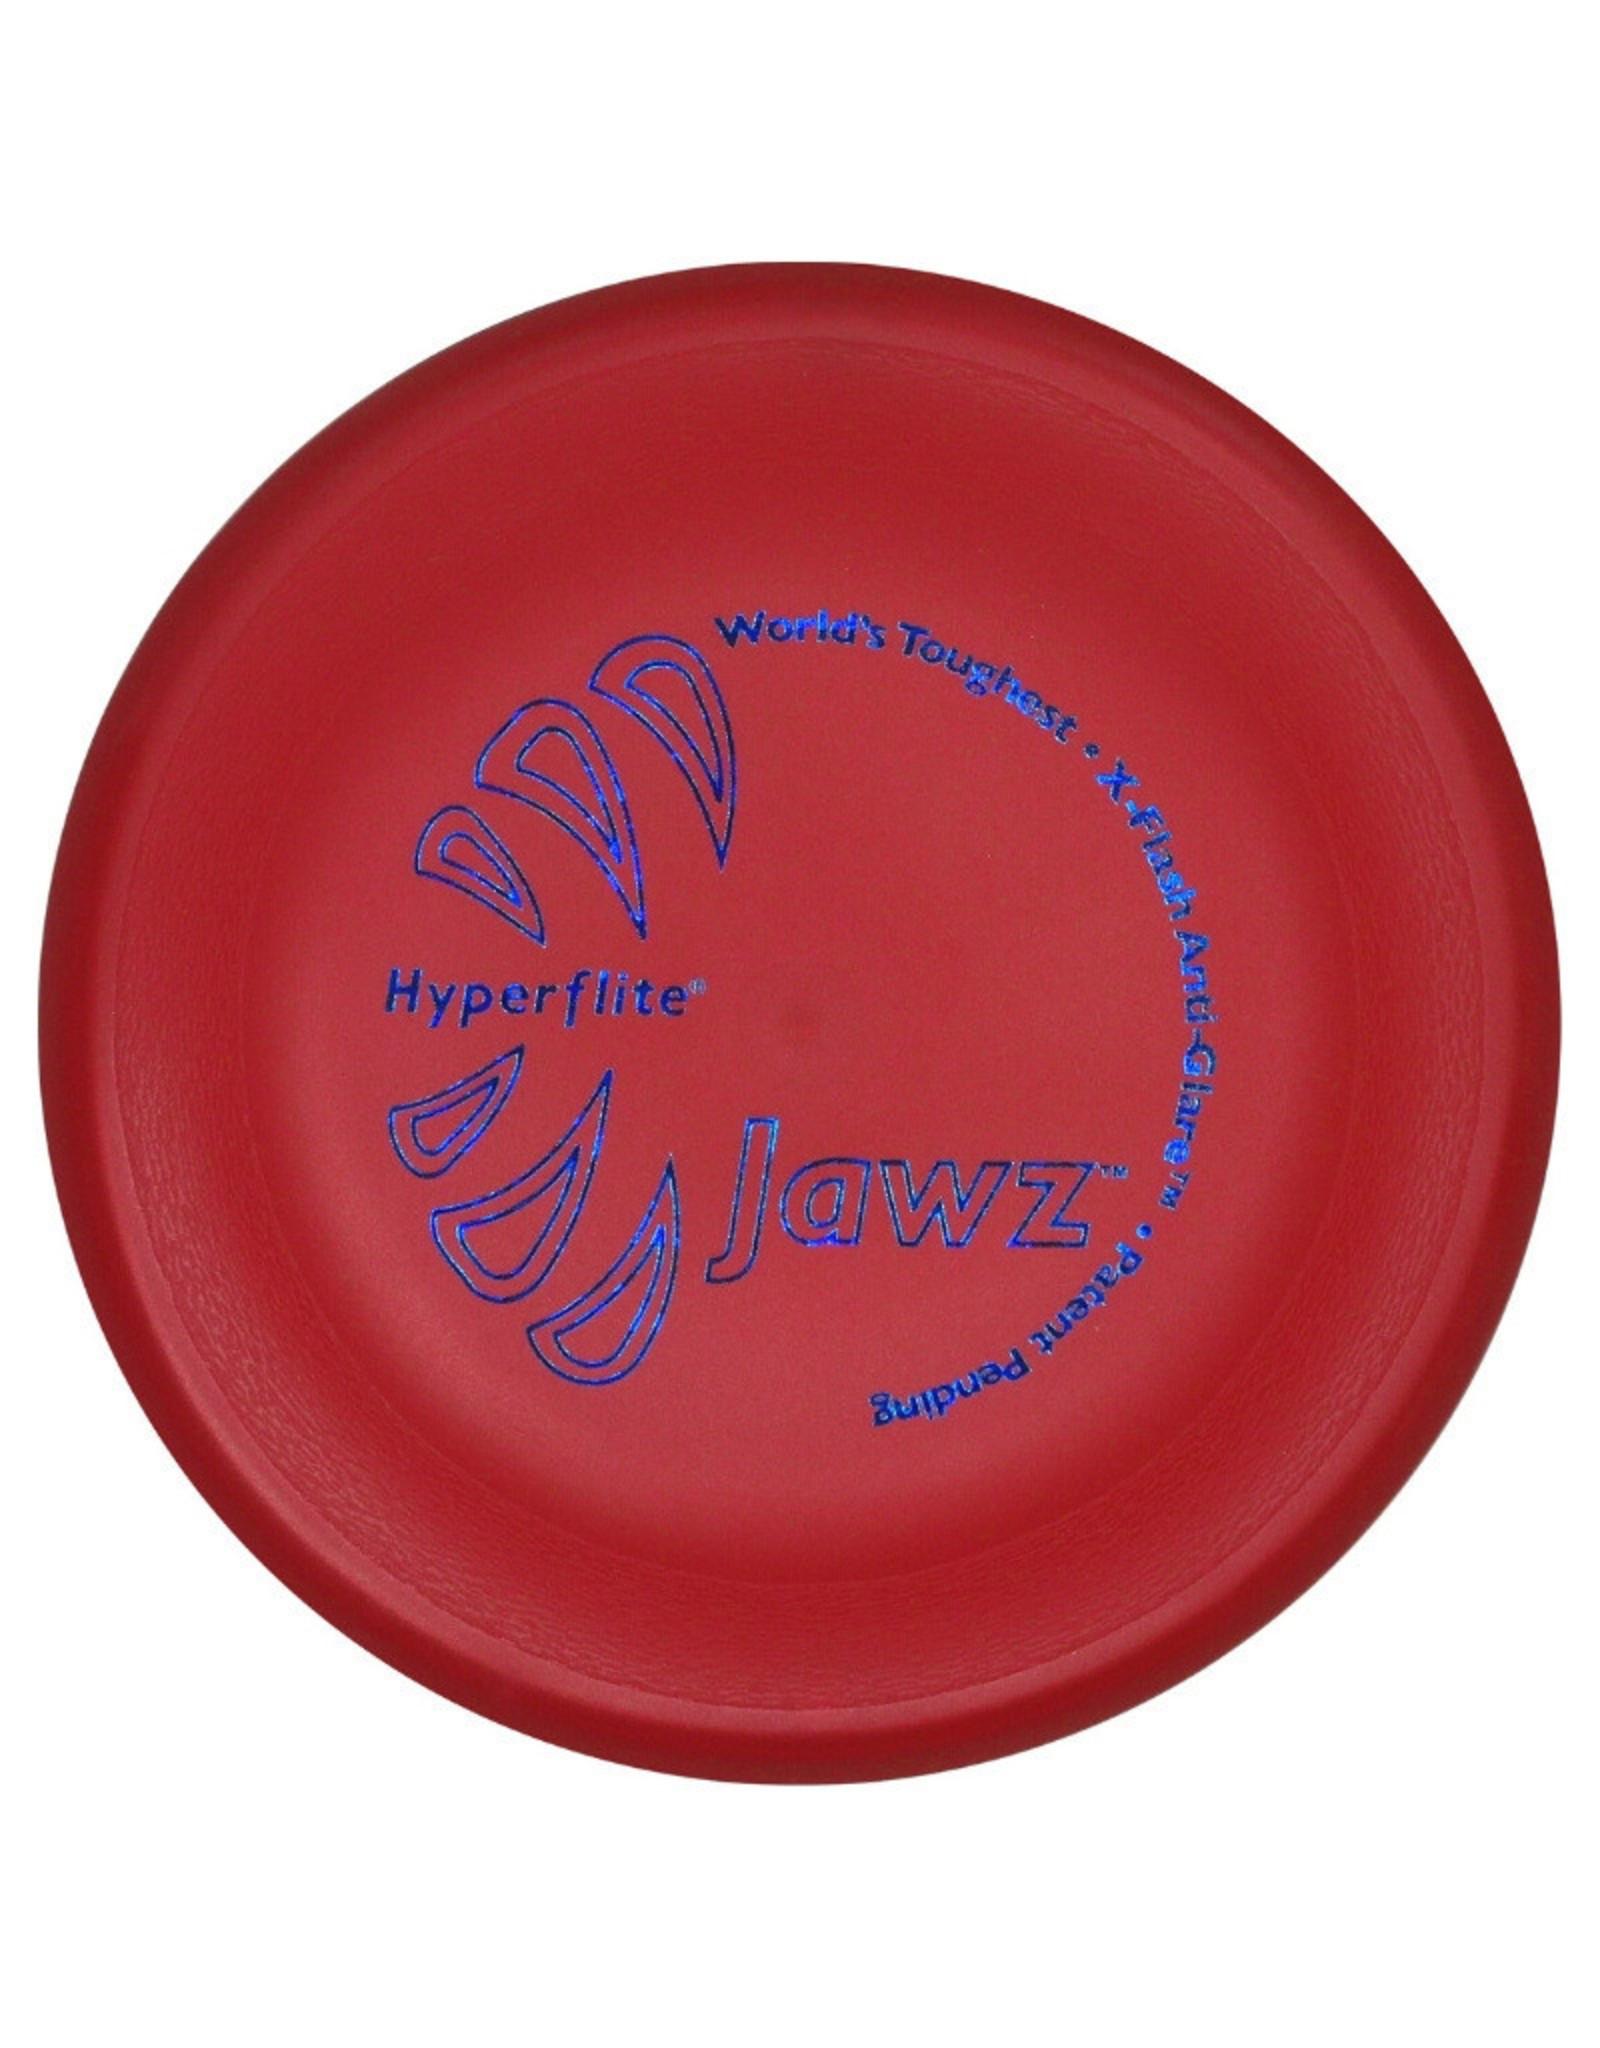 Jaws Jawz Hyperflite Flying Discs